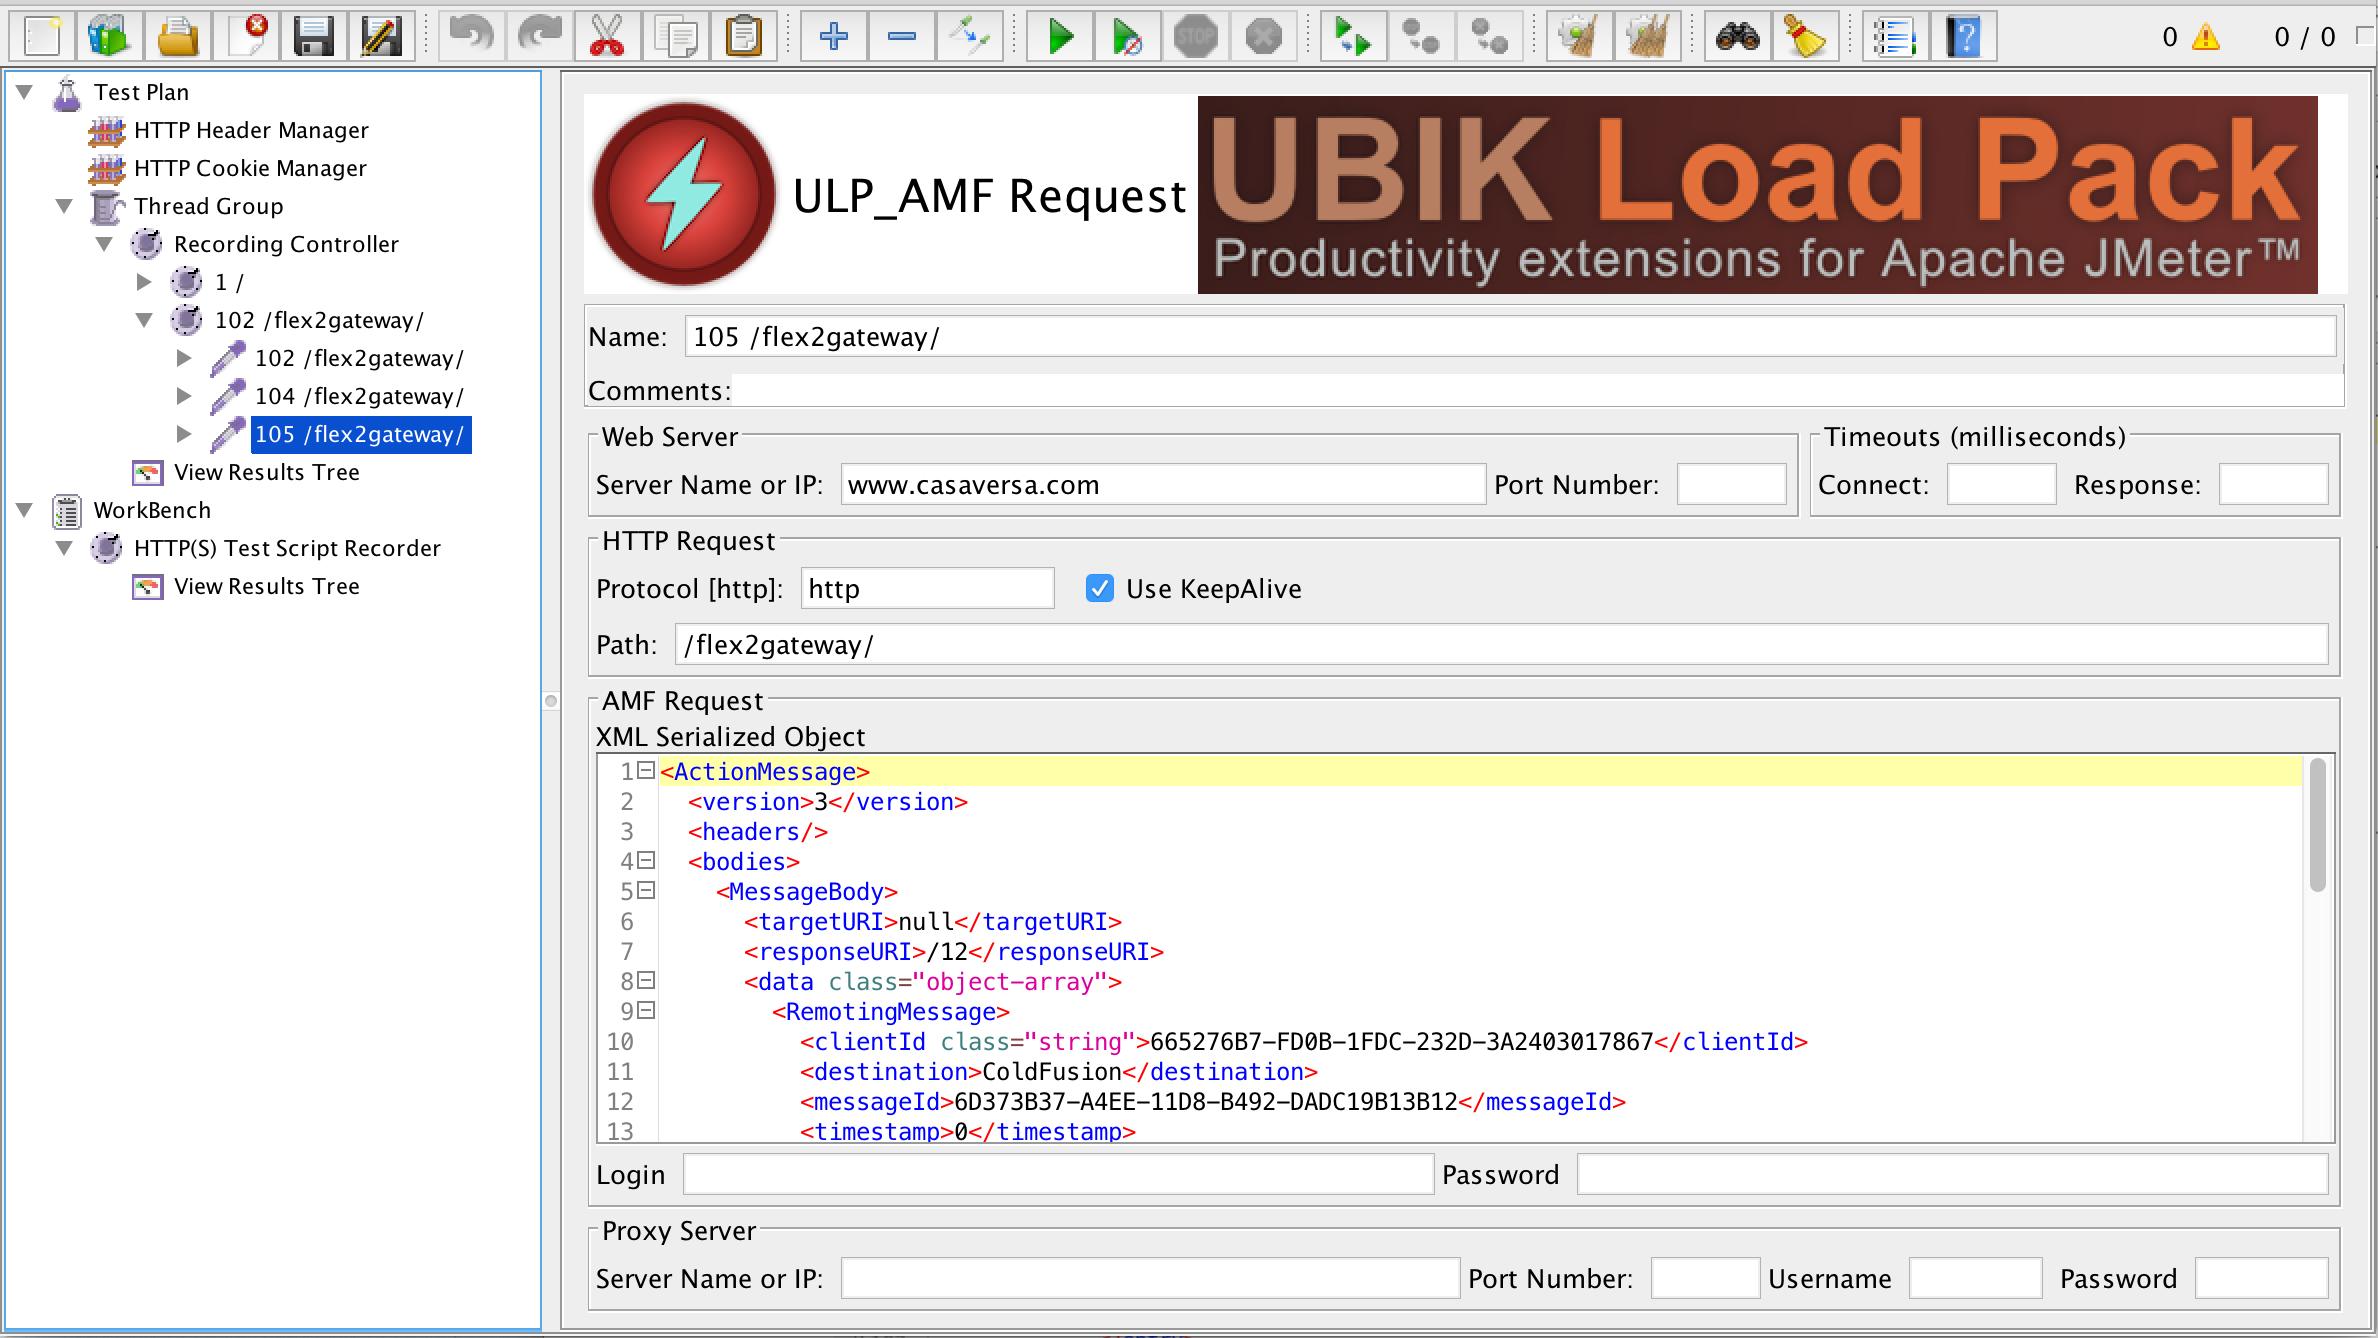 Jmeter flex tutorial with ubikloadpack redline13 screen shot 2015 11 13 at 43219 pm baditri Gallery